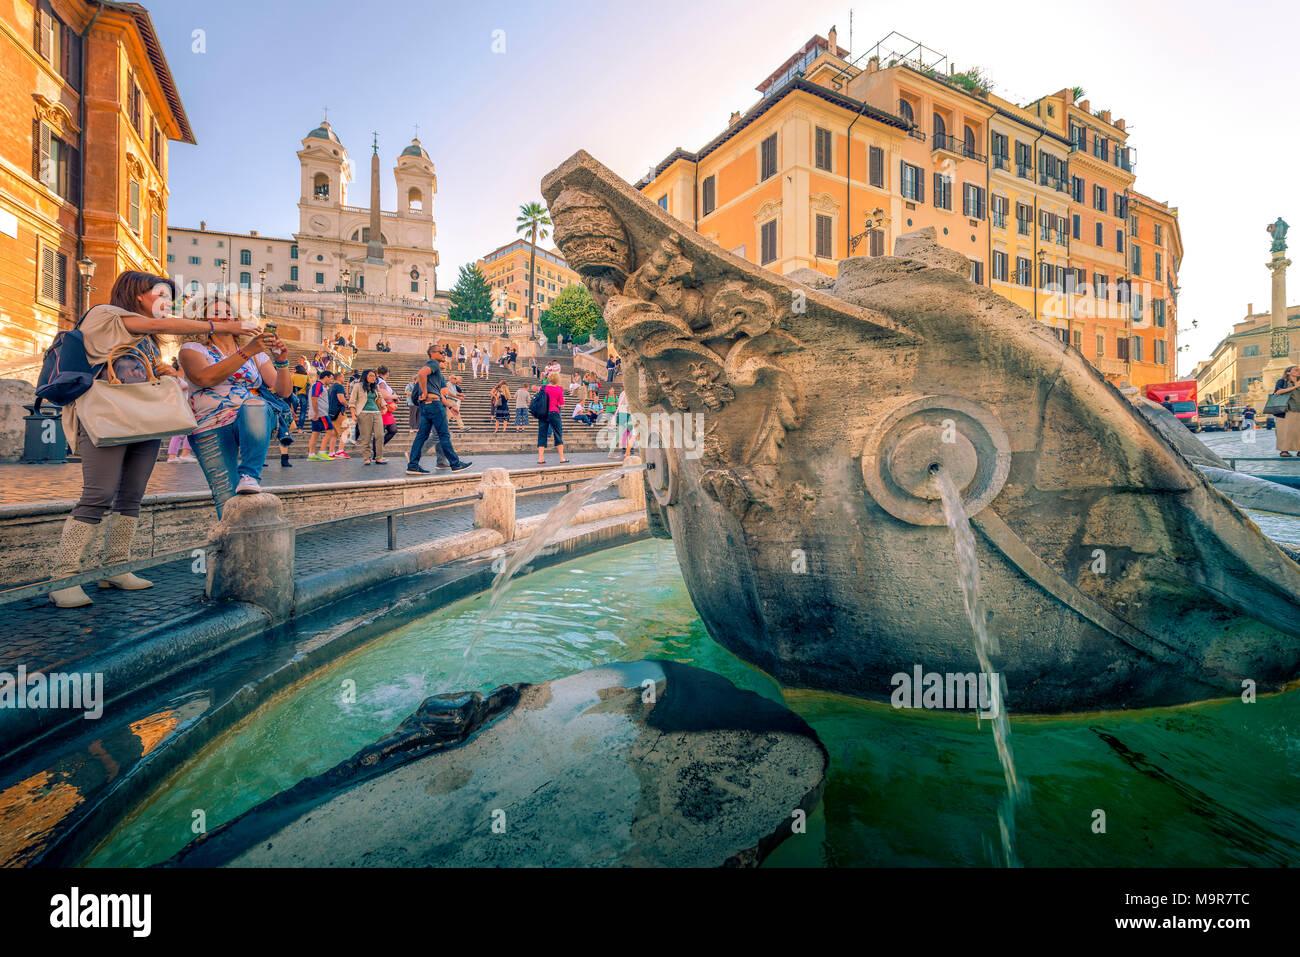 Europa, Italien, Rom, Spanische Treppe, Kirche, Trinita dei Monti Stockbild